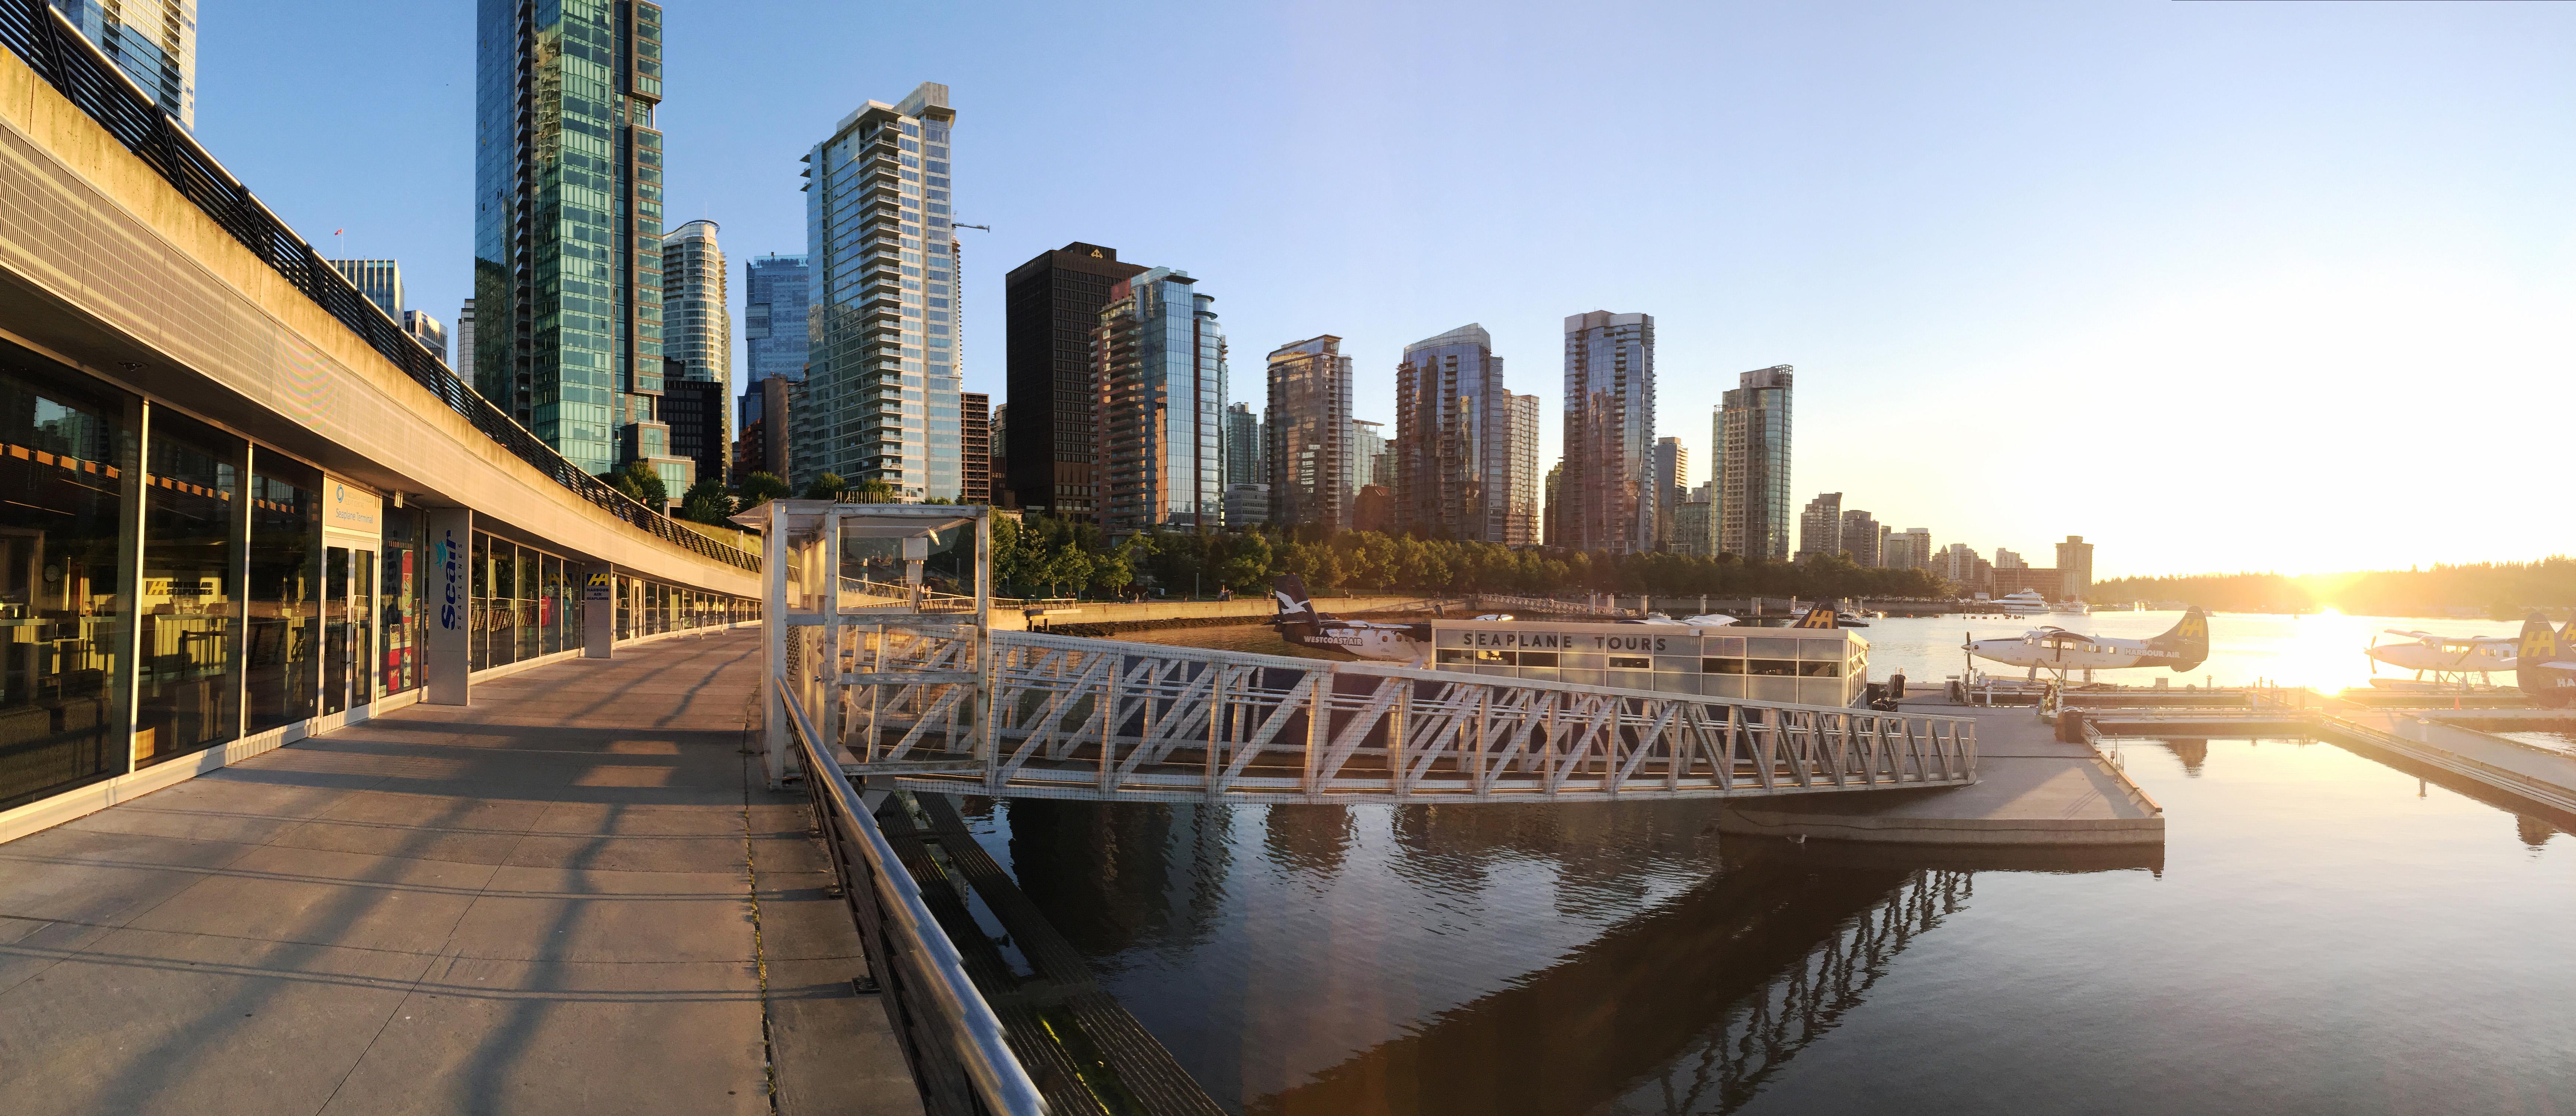 Abendstimmung am Vancouver Harbour